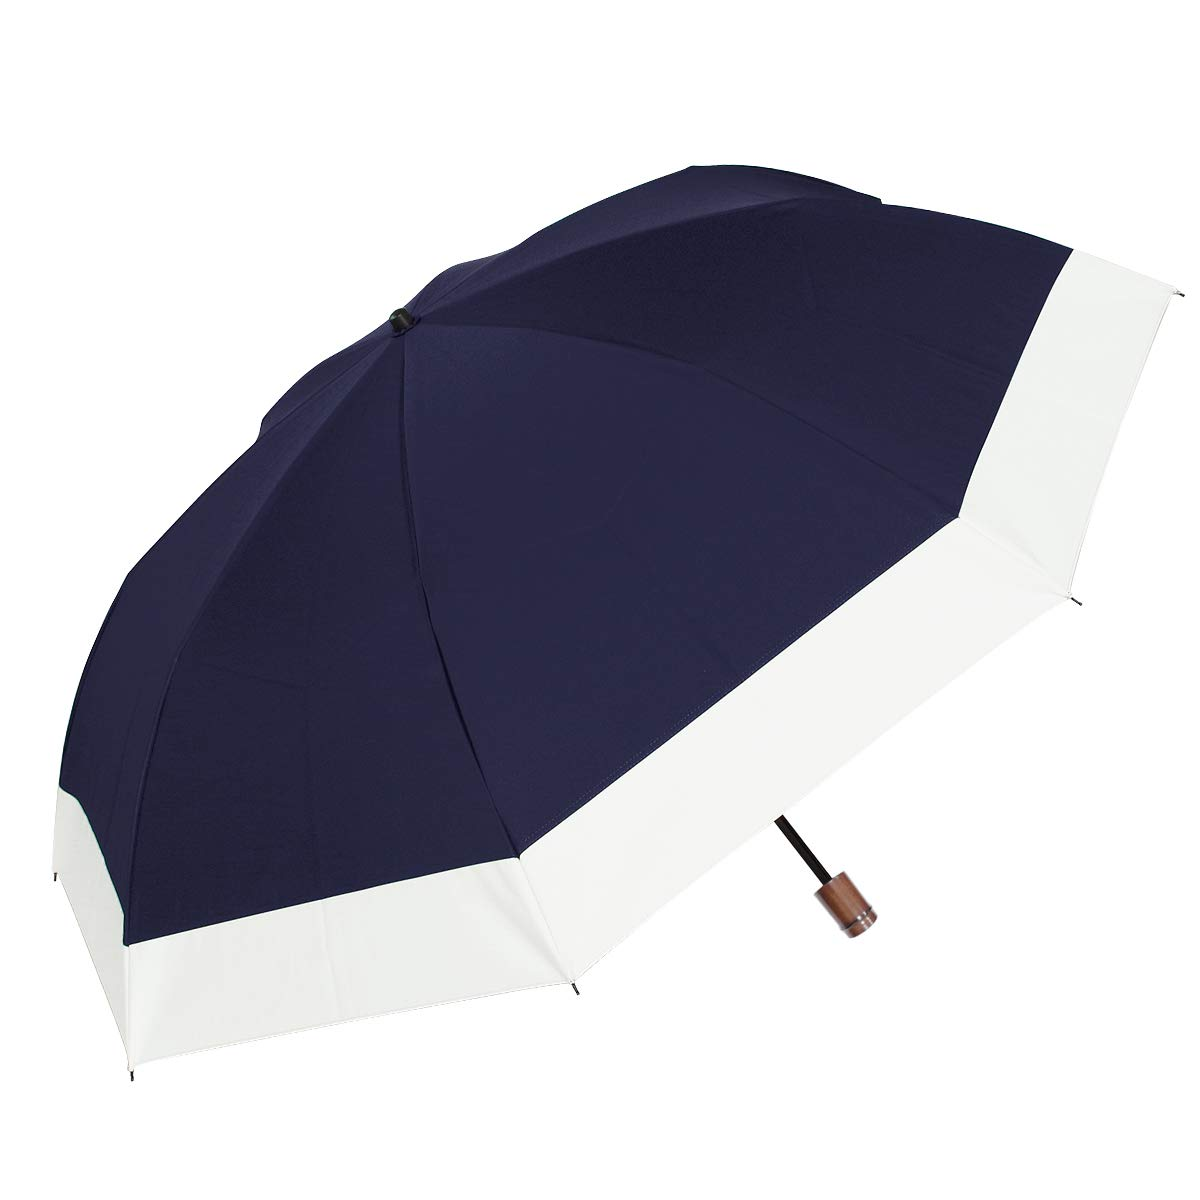 【Rose Blanc】100%完全遮光 日傘 晴雨兼用 コンビ(傘袋付) 2段折りたたみ 男女兼用 ラージサイズ 60cm (ネイビー×アイボリー) B07P62HQY9 ネイビー×アイボリー